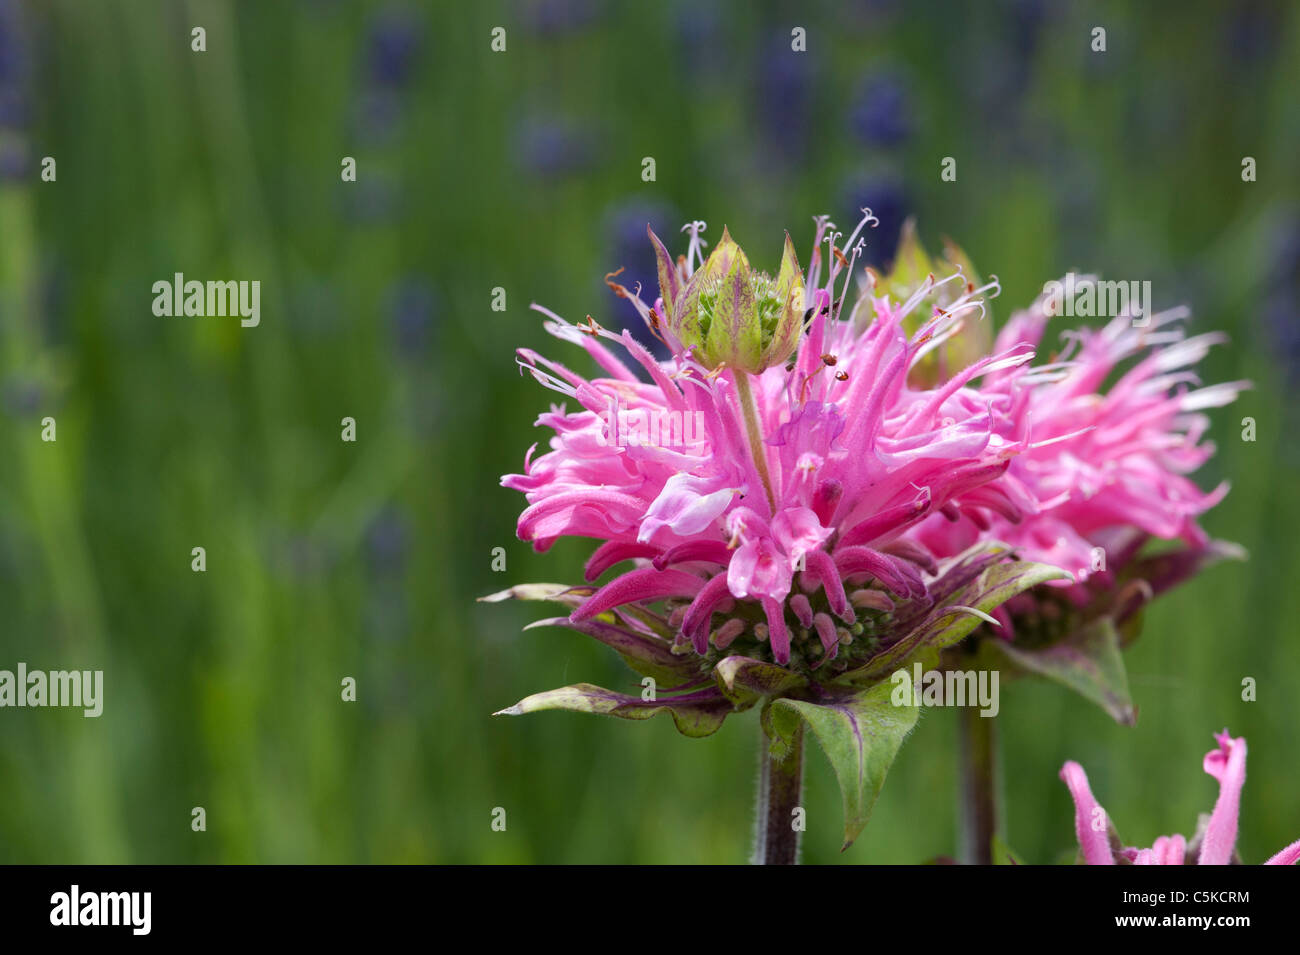 Bergamotte Monarda 'Petite Delight' Blume. Beebalm 'Petite Delight' im Englischen Garten. Großbritannien Stockbild